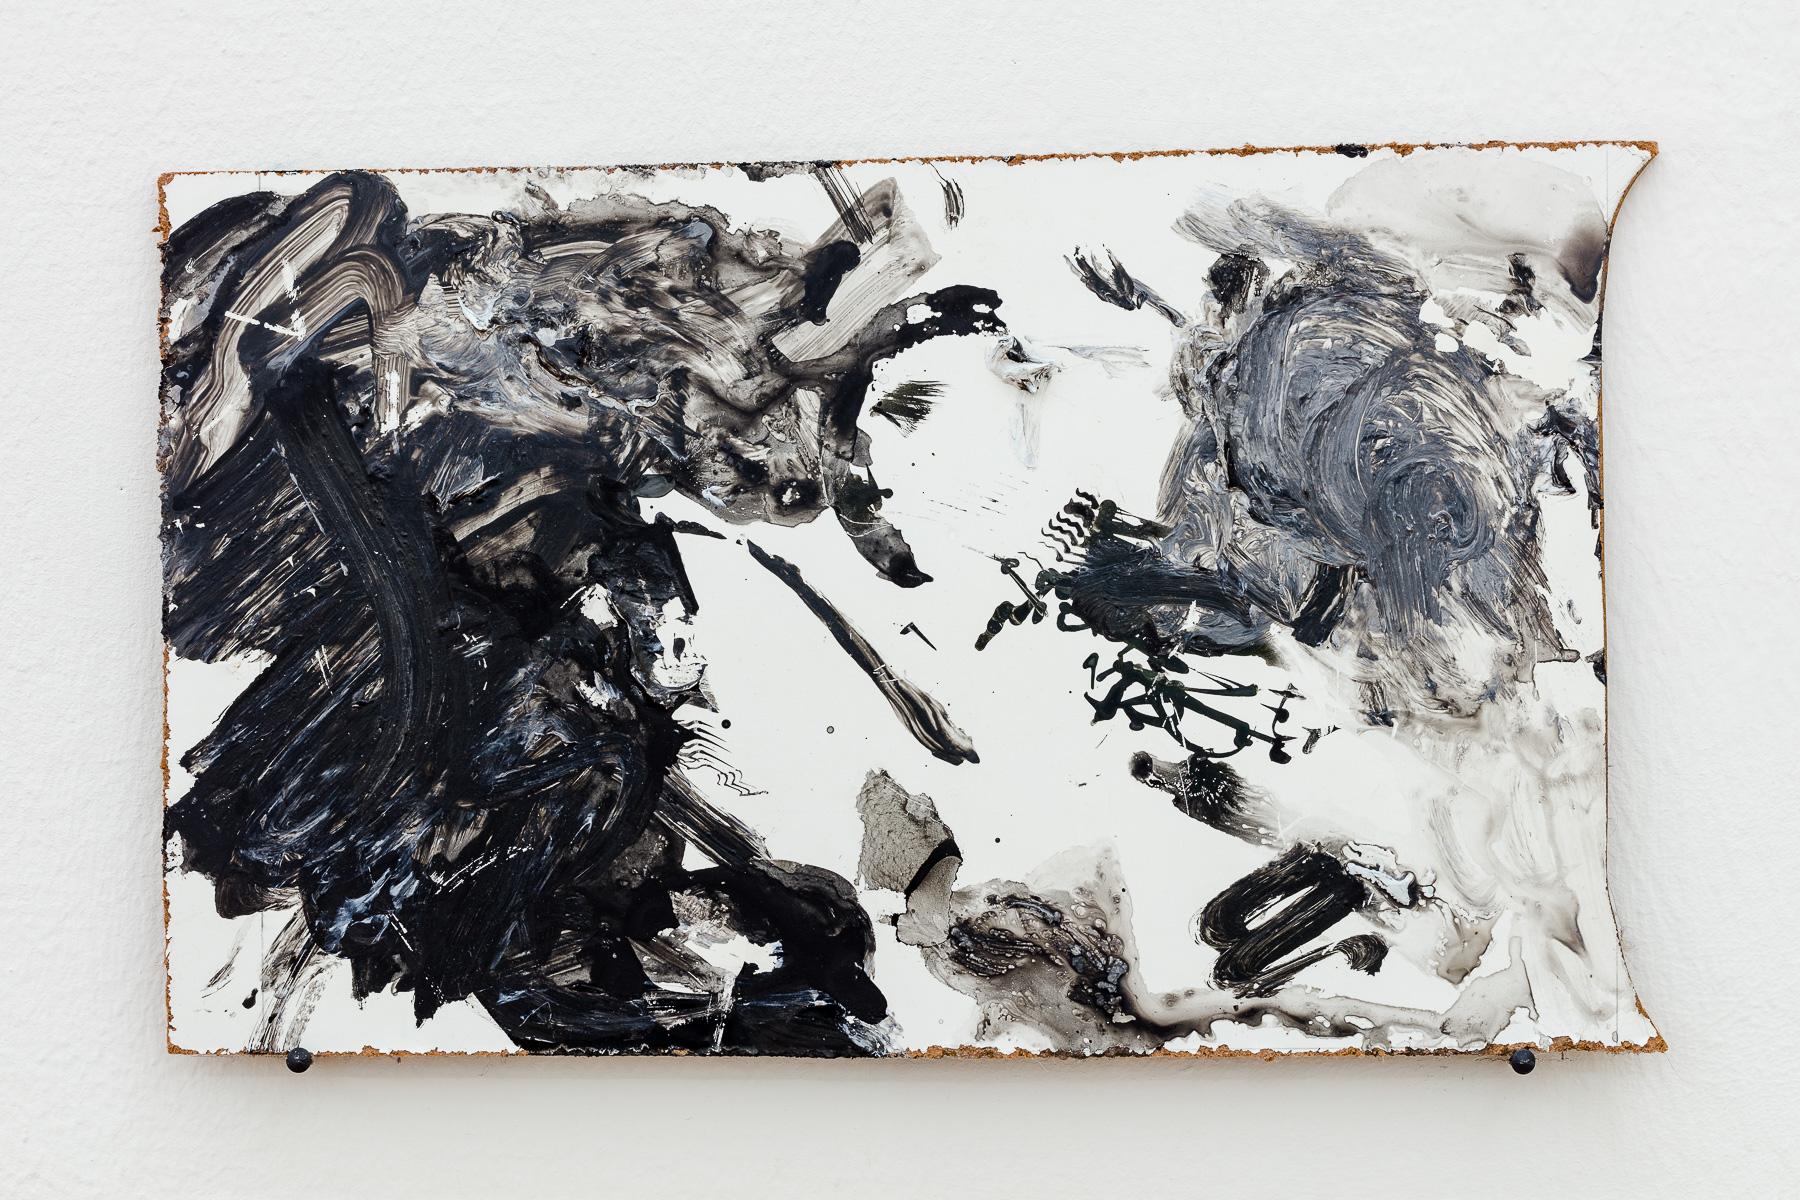 2019_05_20_Elke-Krystufek_Croy-Nielsen_by-kunst-dokumentation-com_001_web.jpg